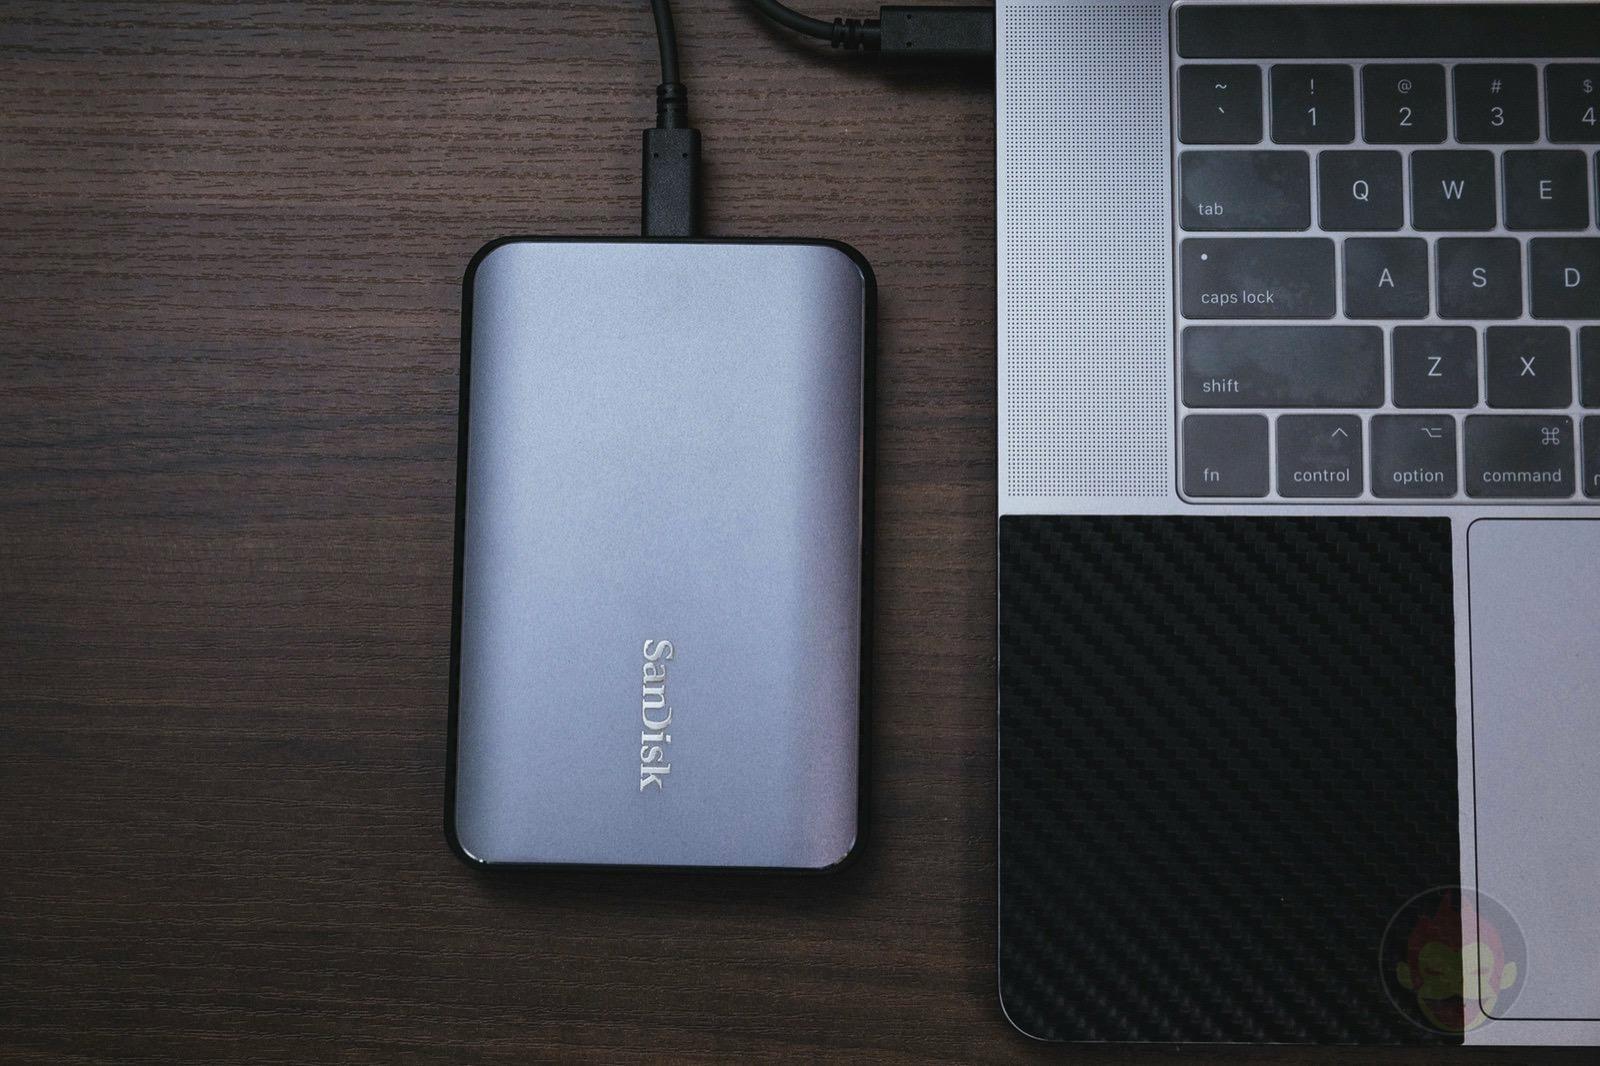 Sandisk-Extreme900-Portable-ssd-07.jpg